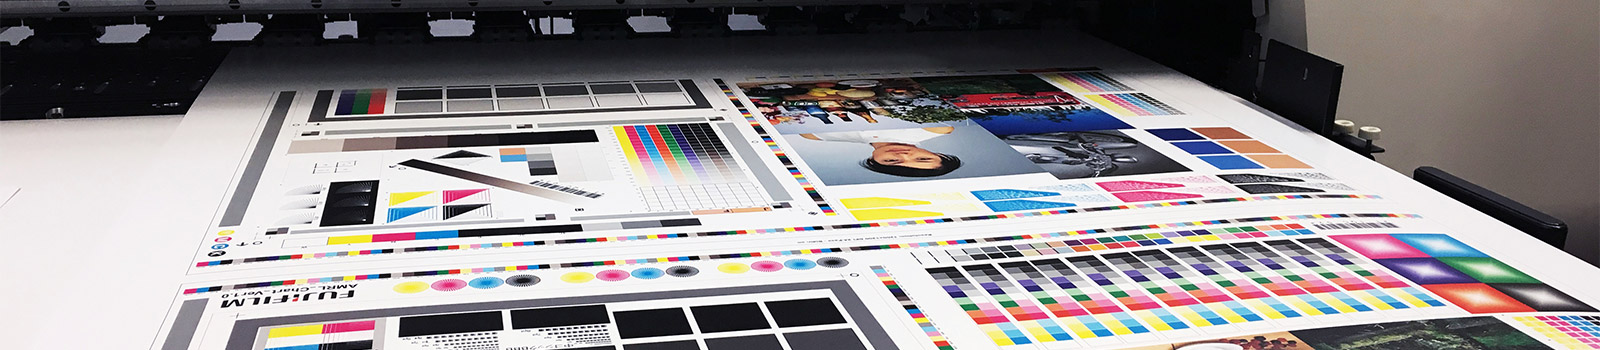 Großformatdruck / Large Format Printing bei Satzdruck in Coesfeld.